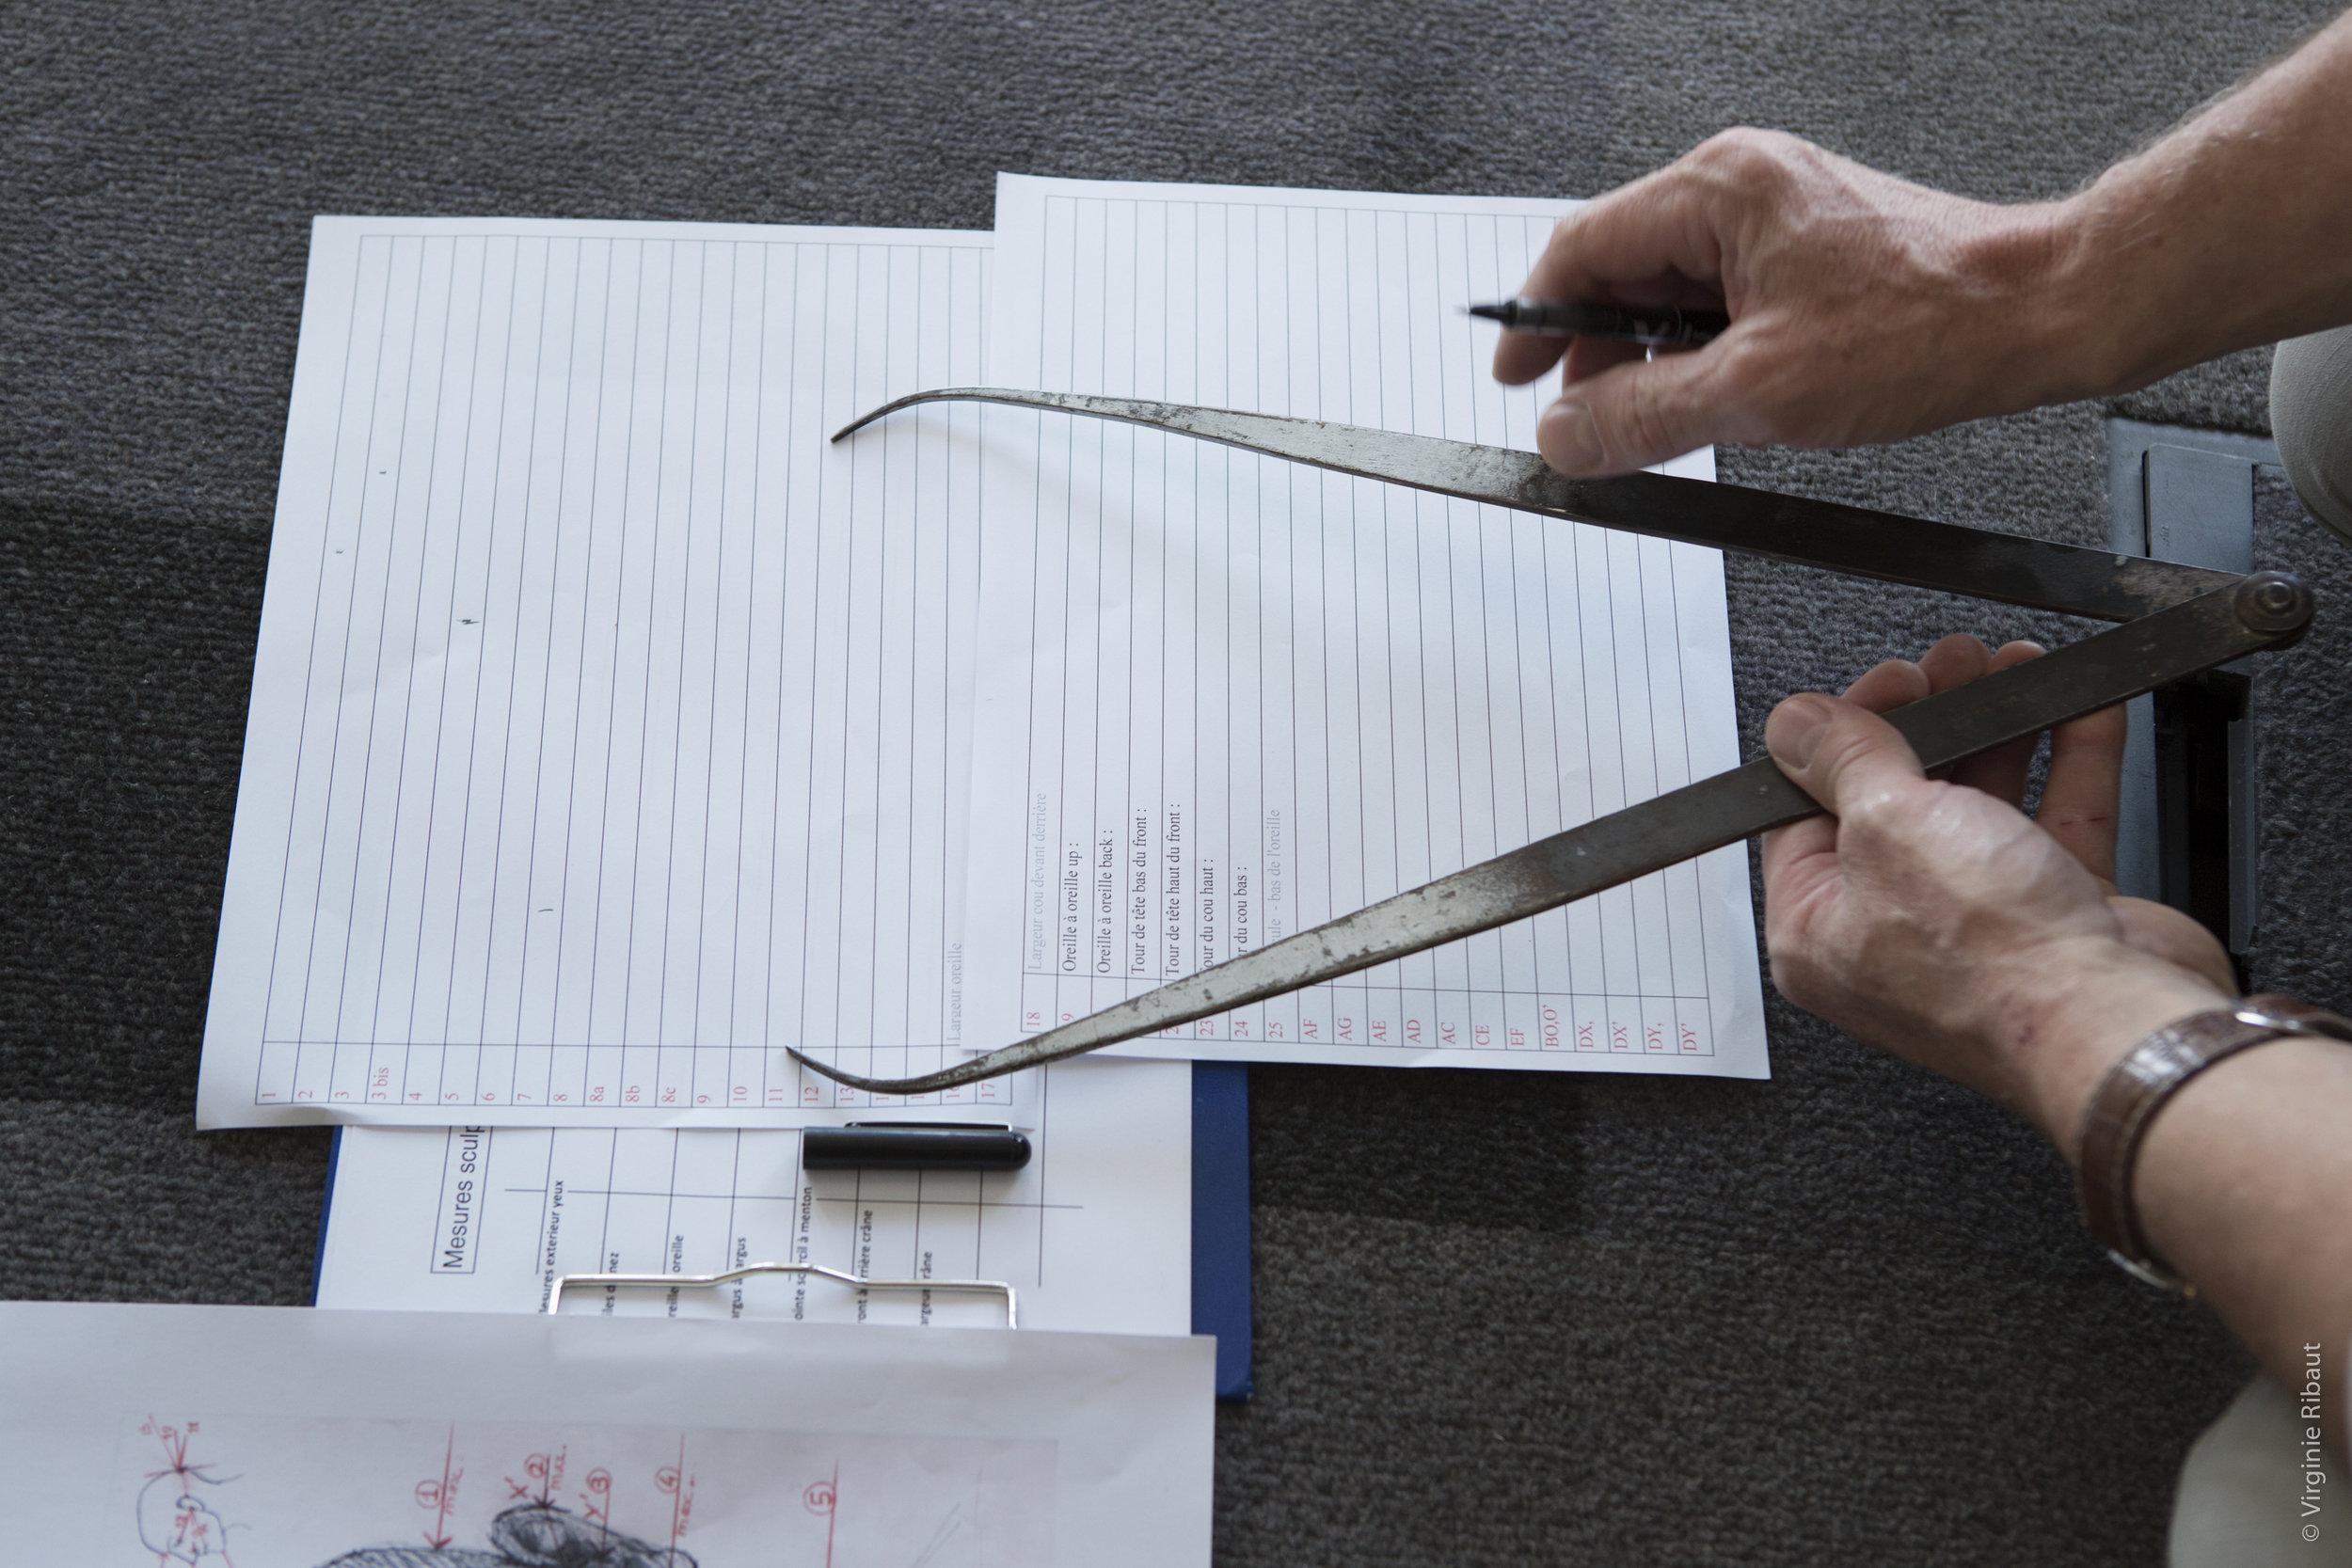 Ranveer Singh - Measurements by Eric Saint Chaffray - Credit Musée Grévin